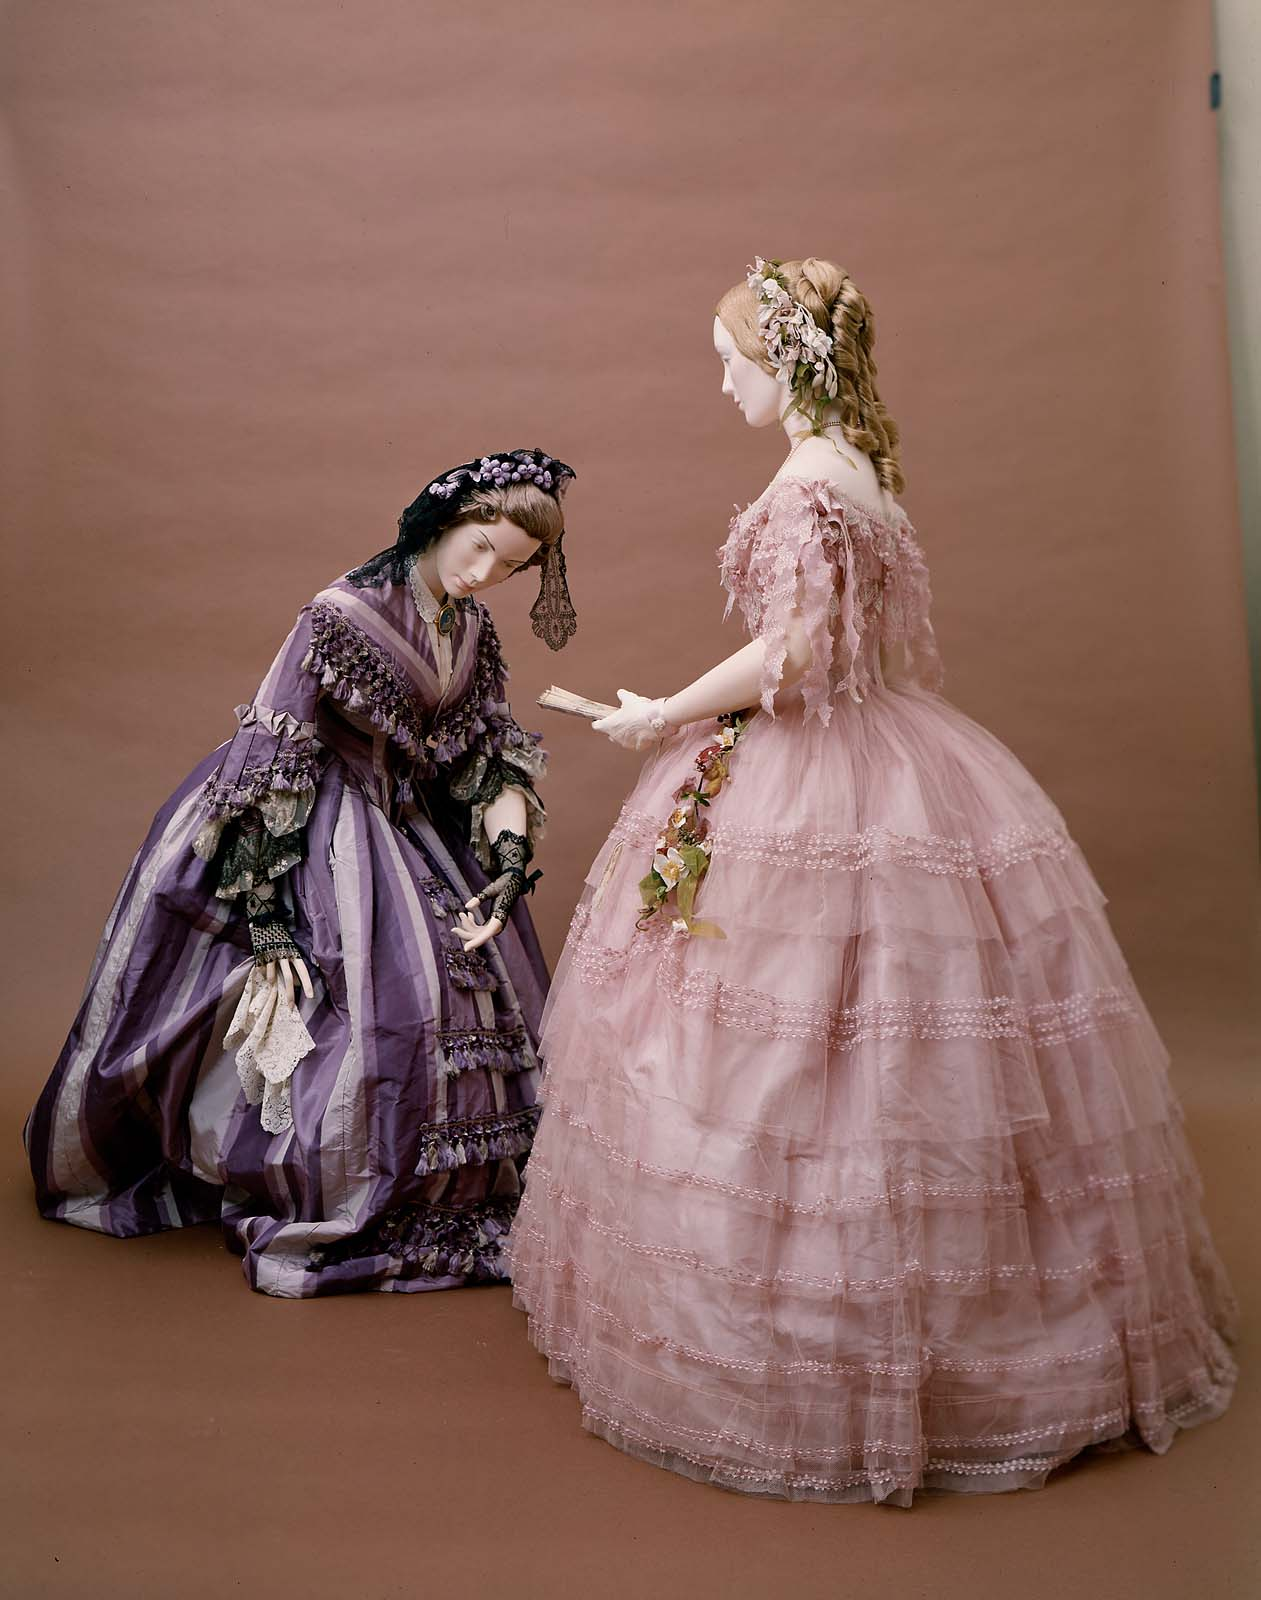 Woman's dress, American about 1856–58, Silk plain weave ( taffeta), trimmed with silk fringe tassels, machine embroidered net, bobbin lace, MFA Boston, 50.474a-b